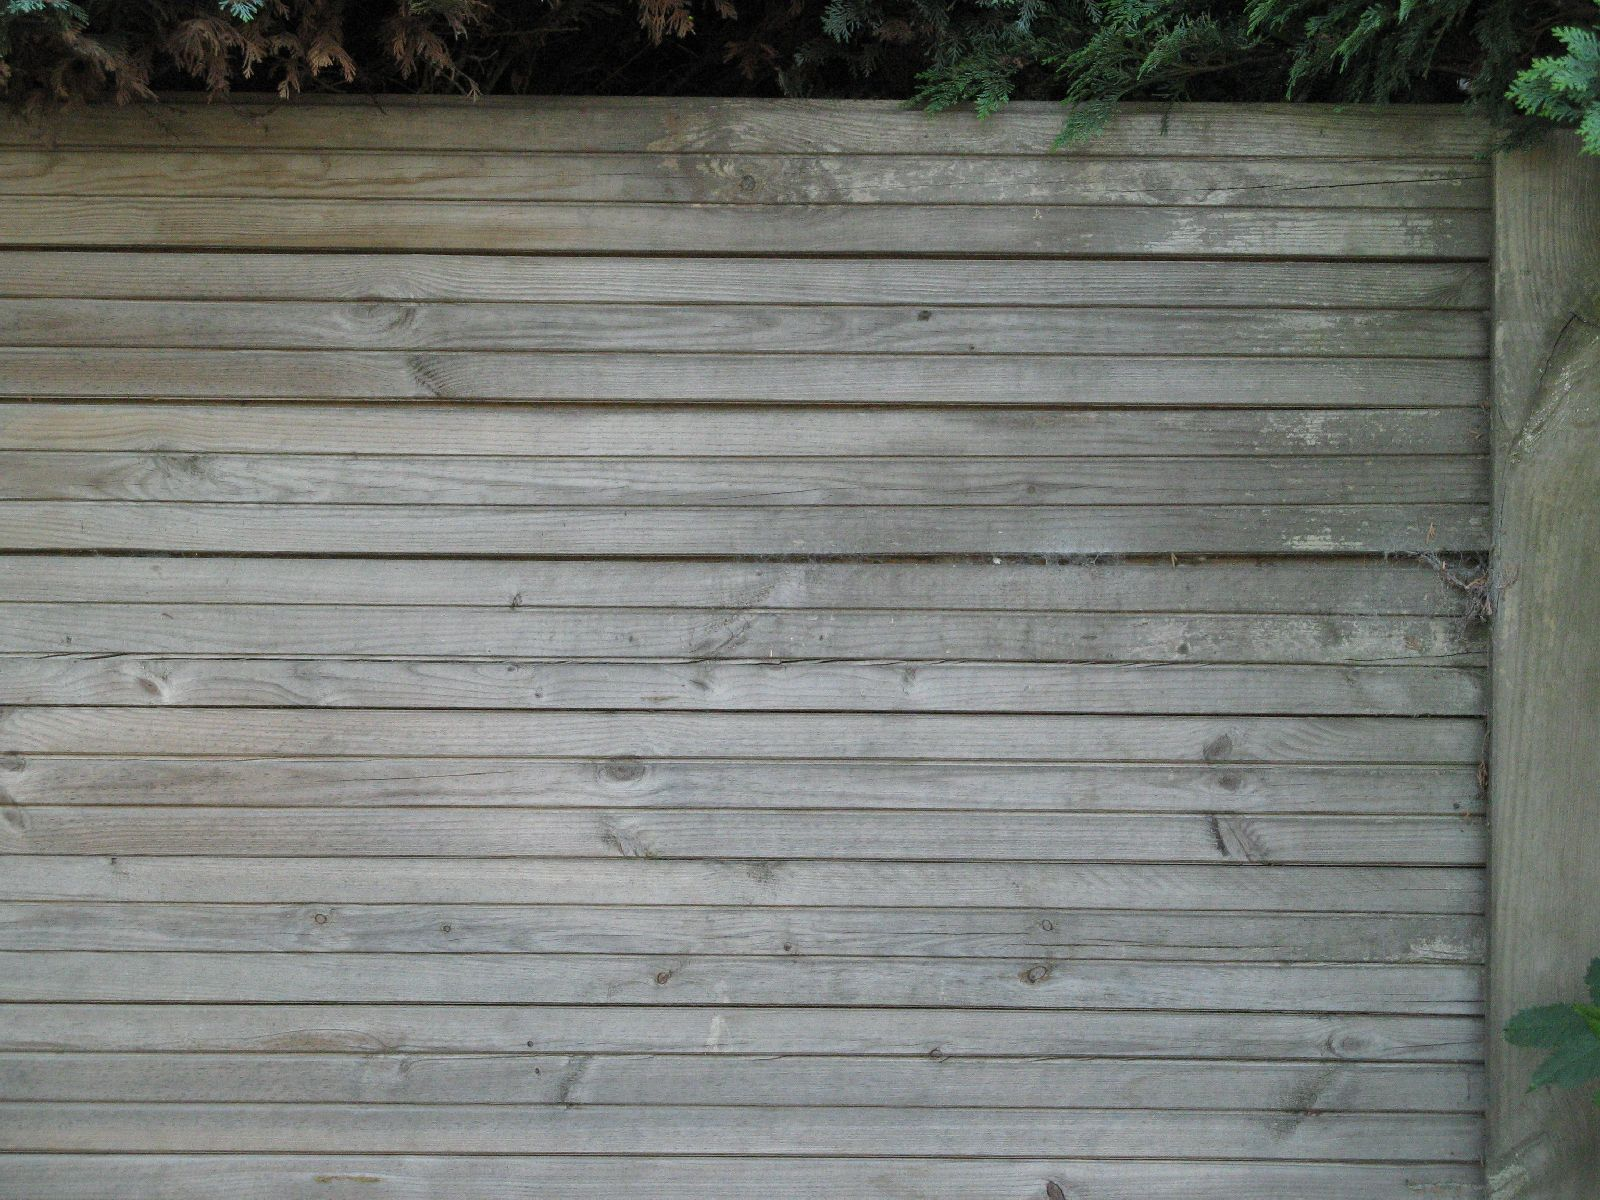 Wood_Textures_B_1173